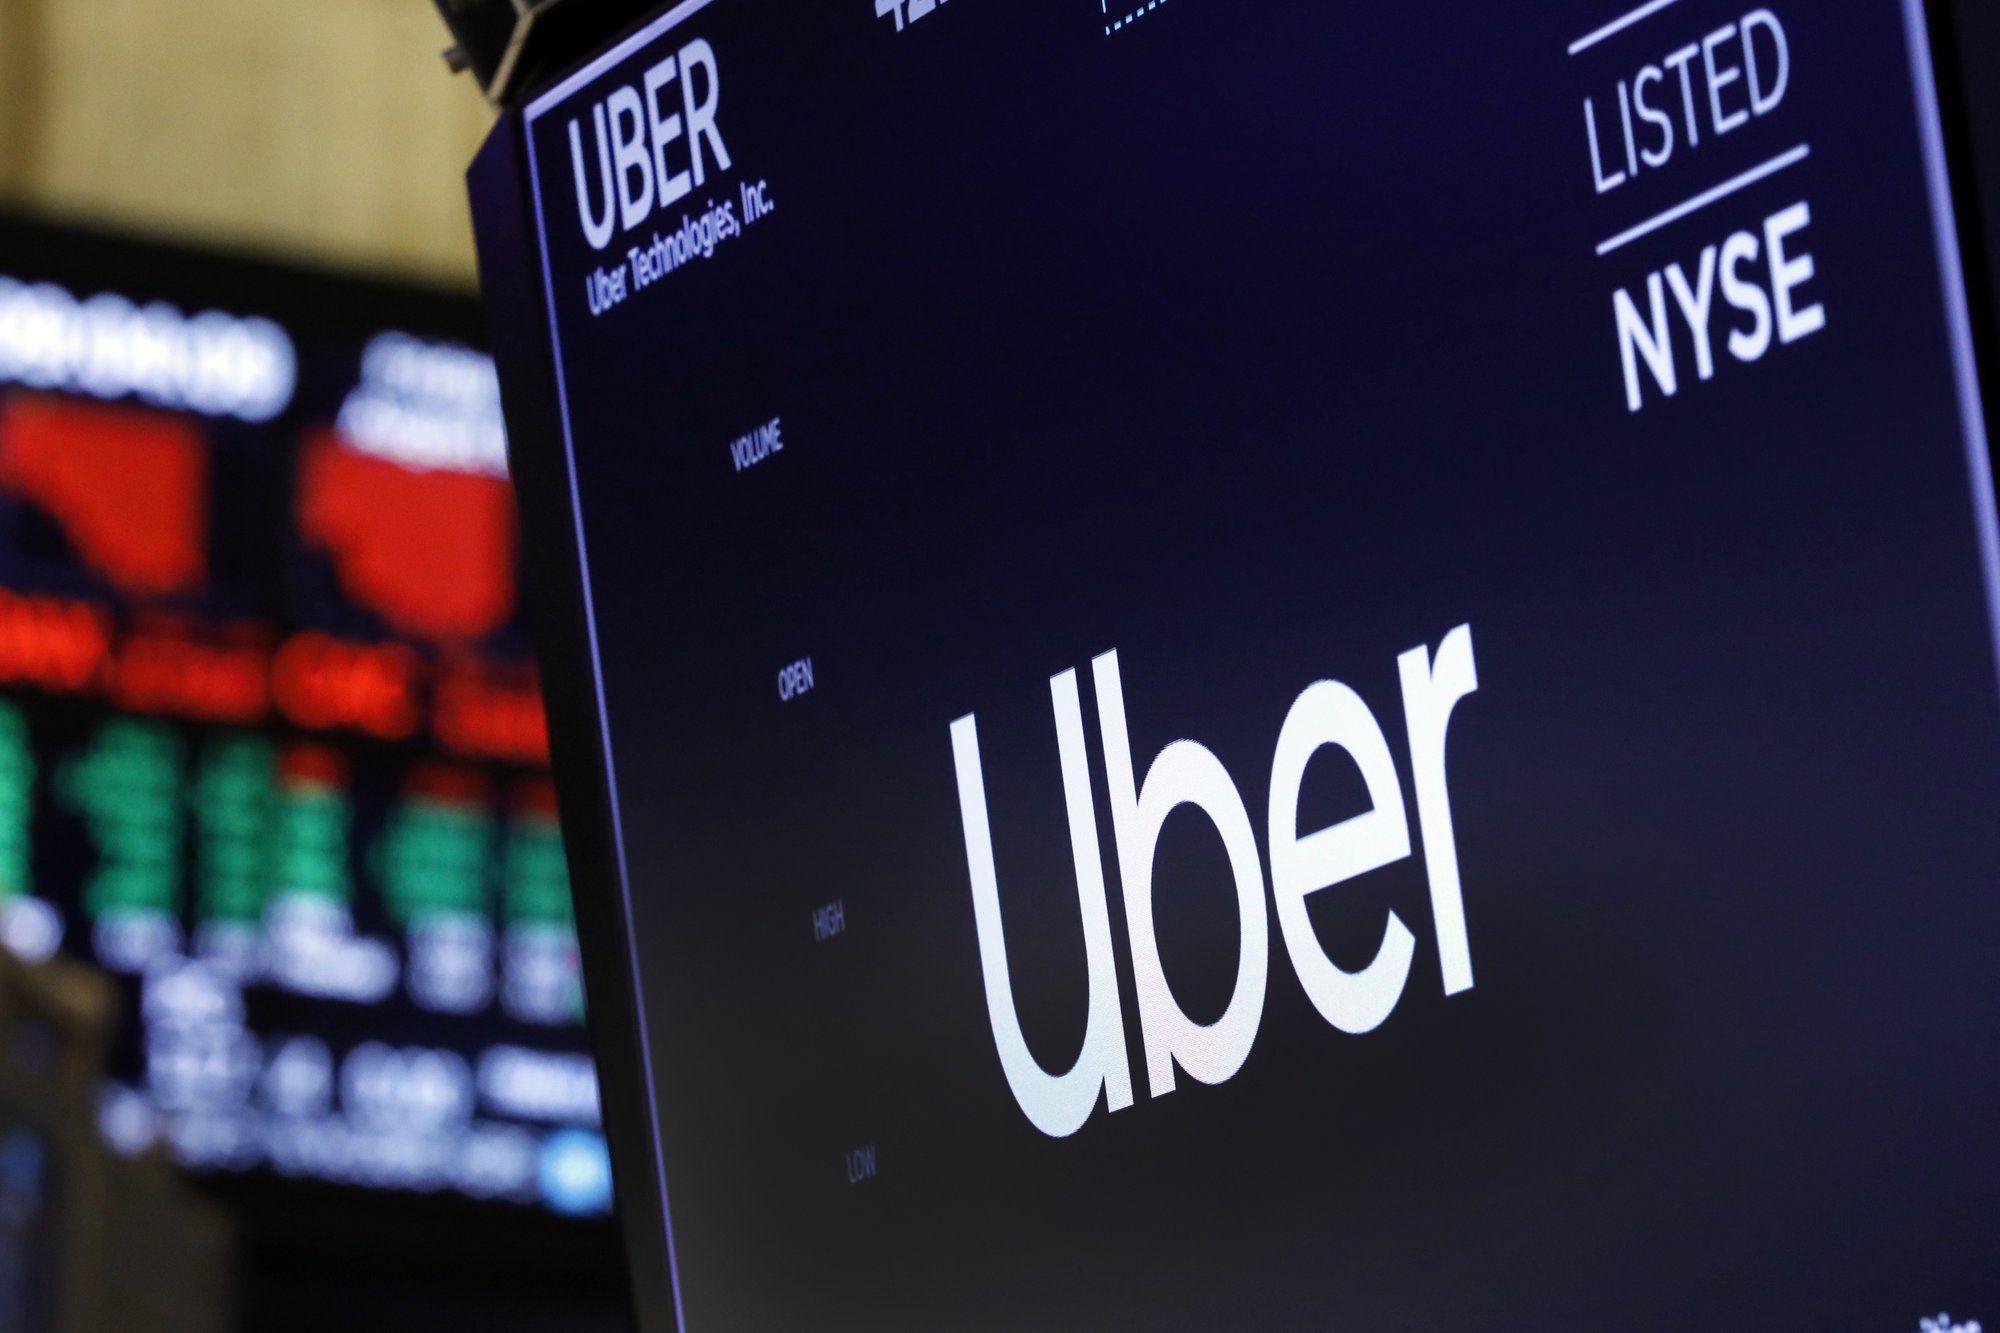 Uber to open regional hub in Dallas, resulting in 3,000 jobs